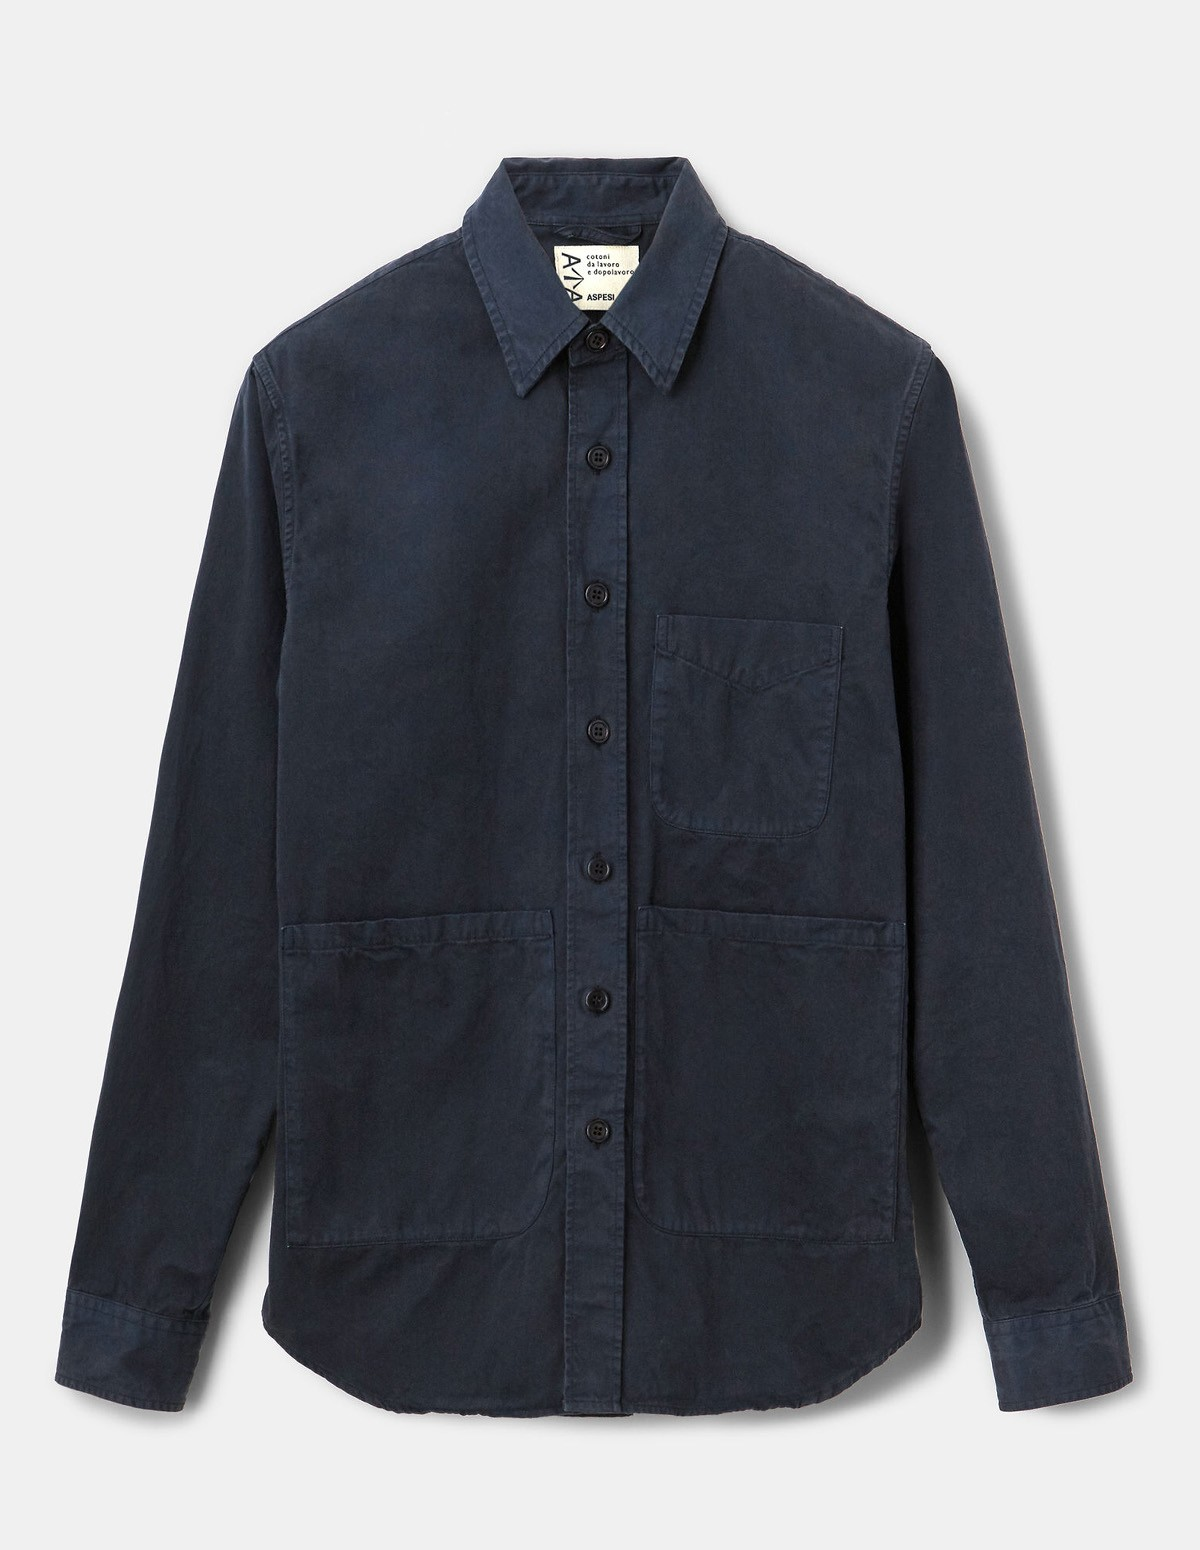 Aspesi Ut Shirt